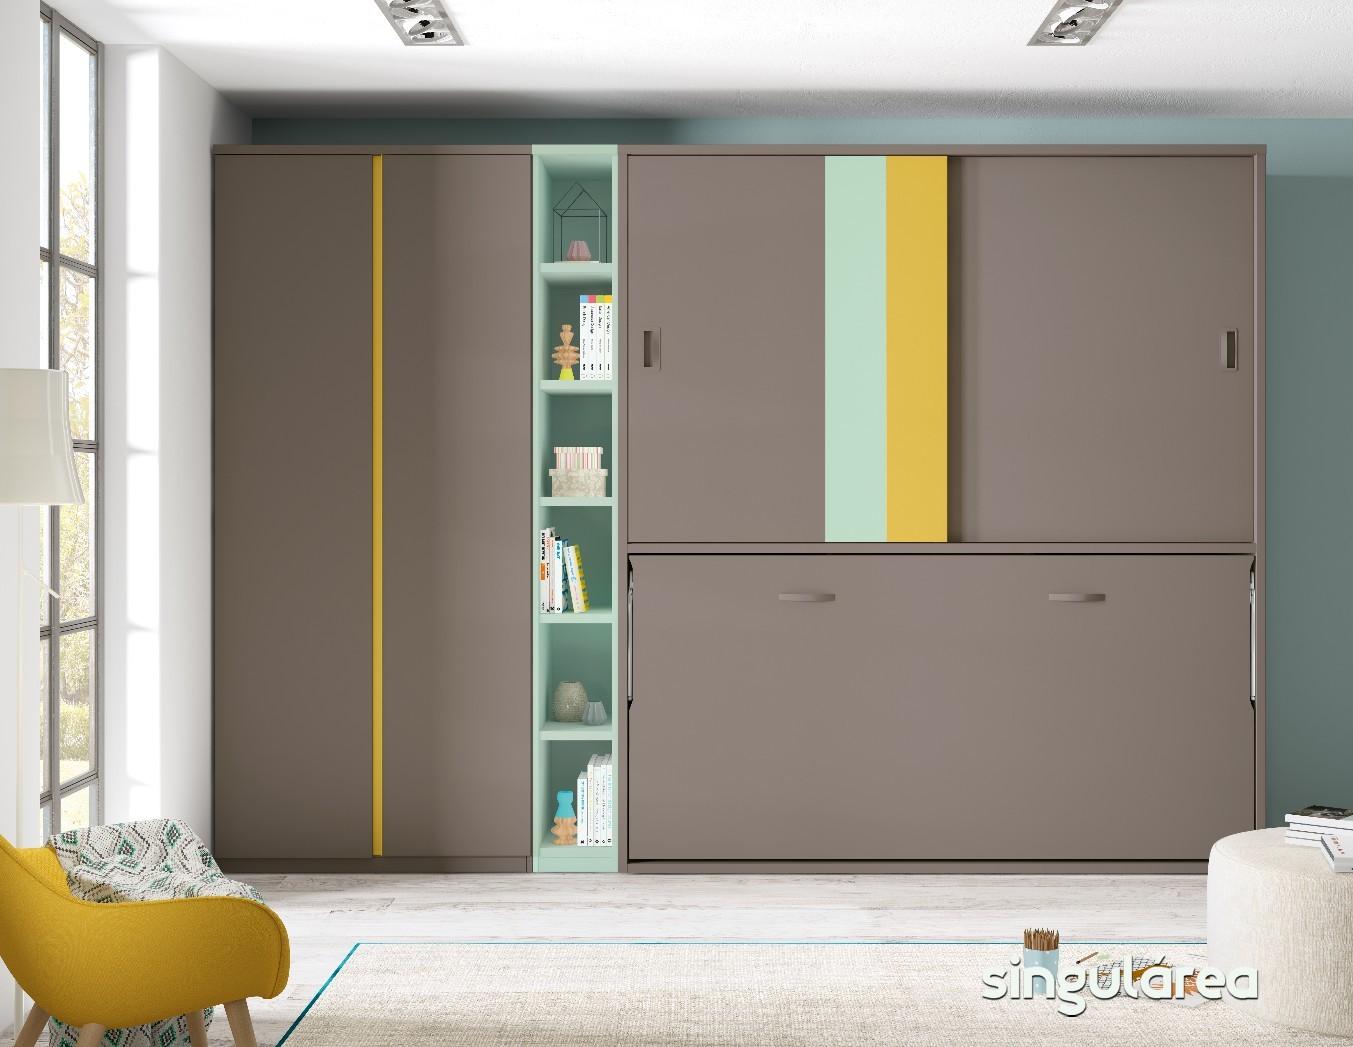 Juvenil abatible 2138 - Habitaciones juveniles camas abatibles horizontales ...